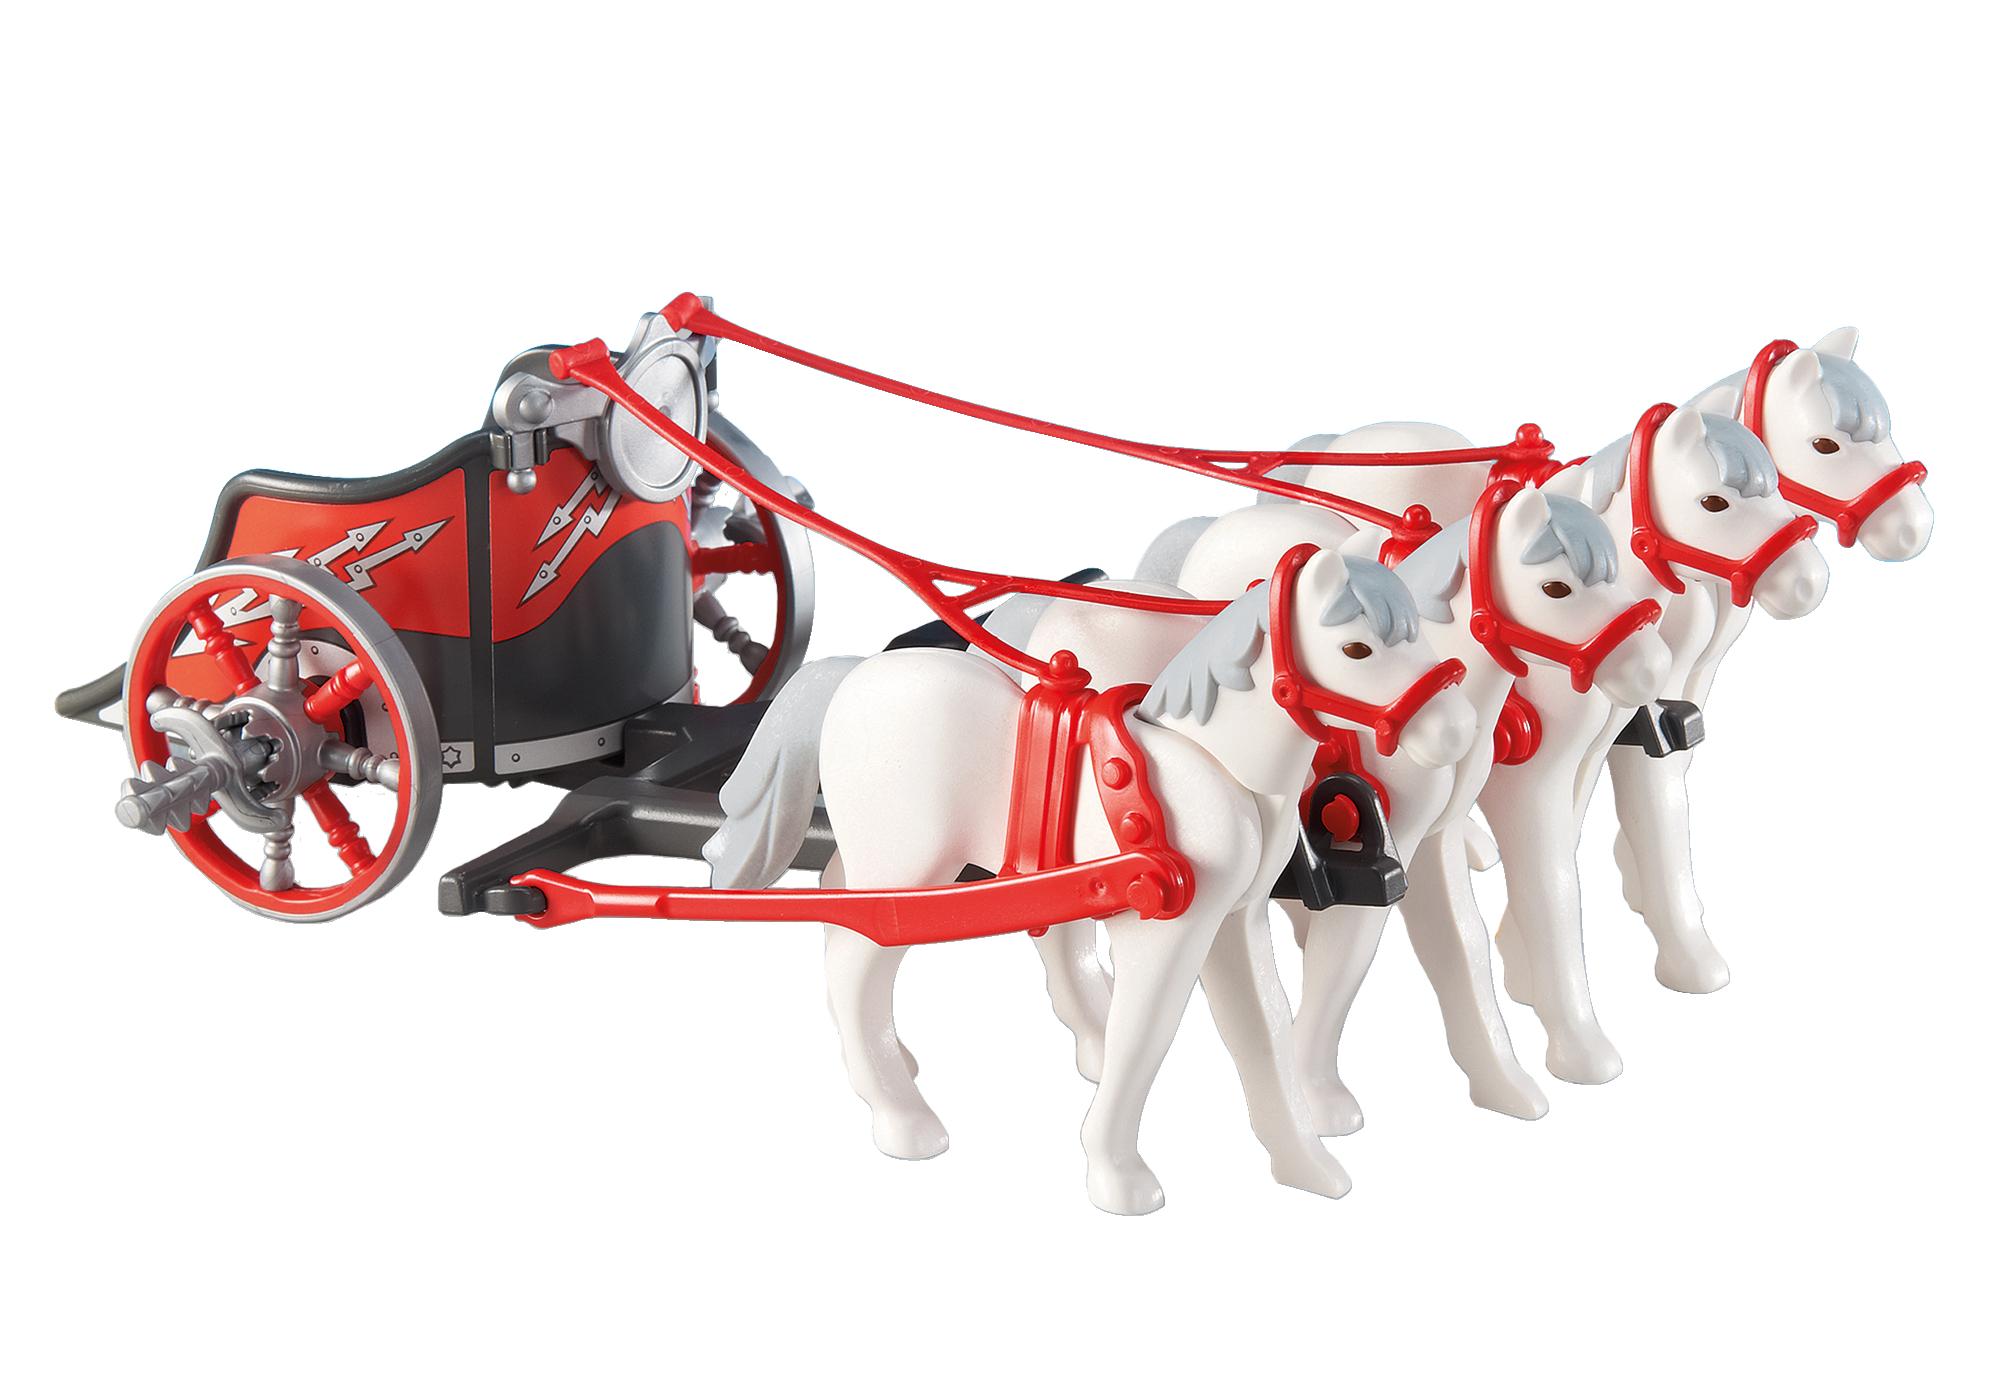 http://media.playmobil.com/i/playmobil/6496_product_detail/Romeins vierspan